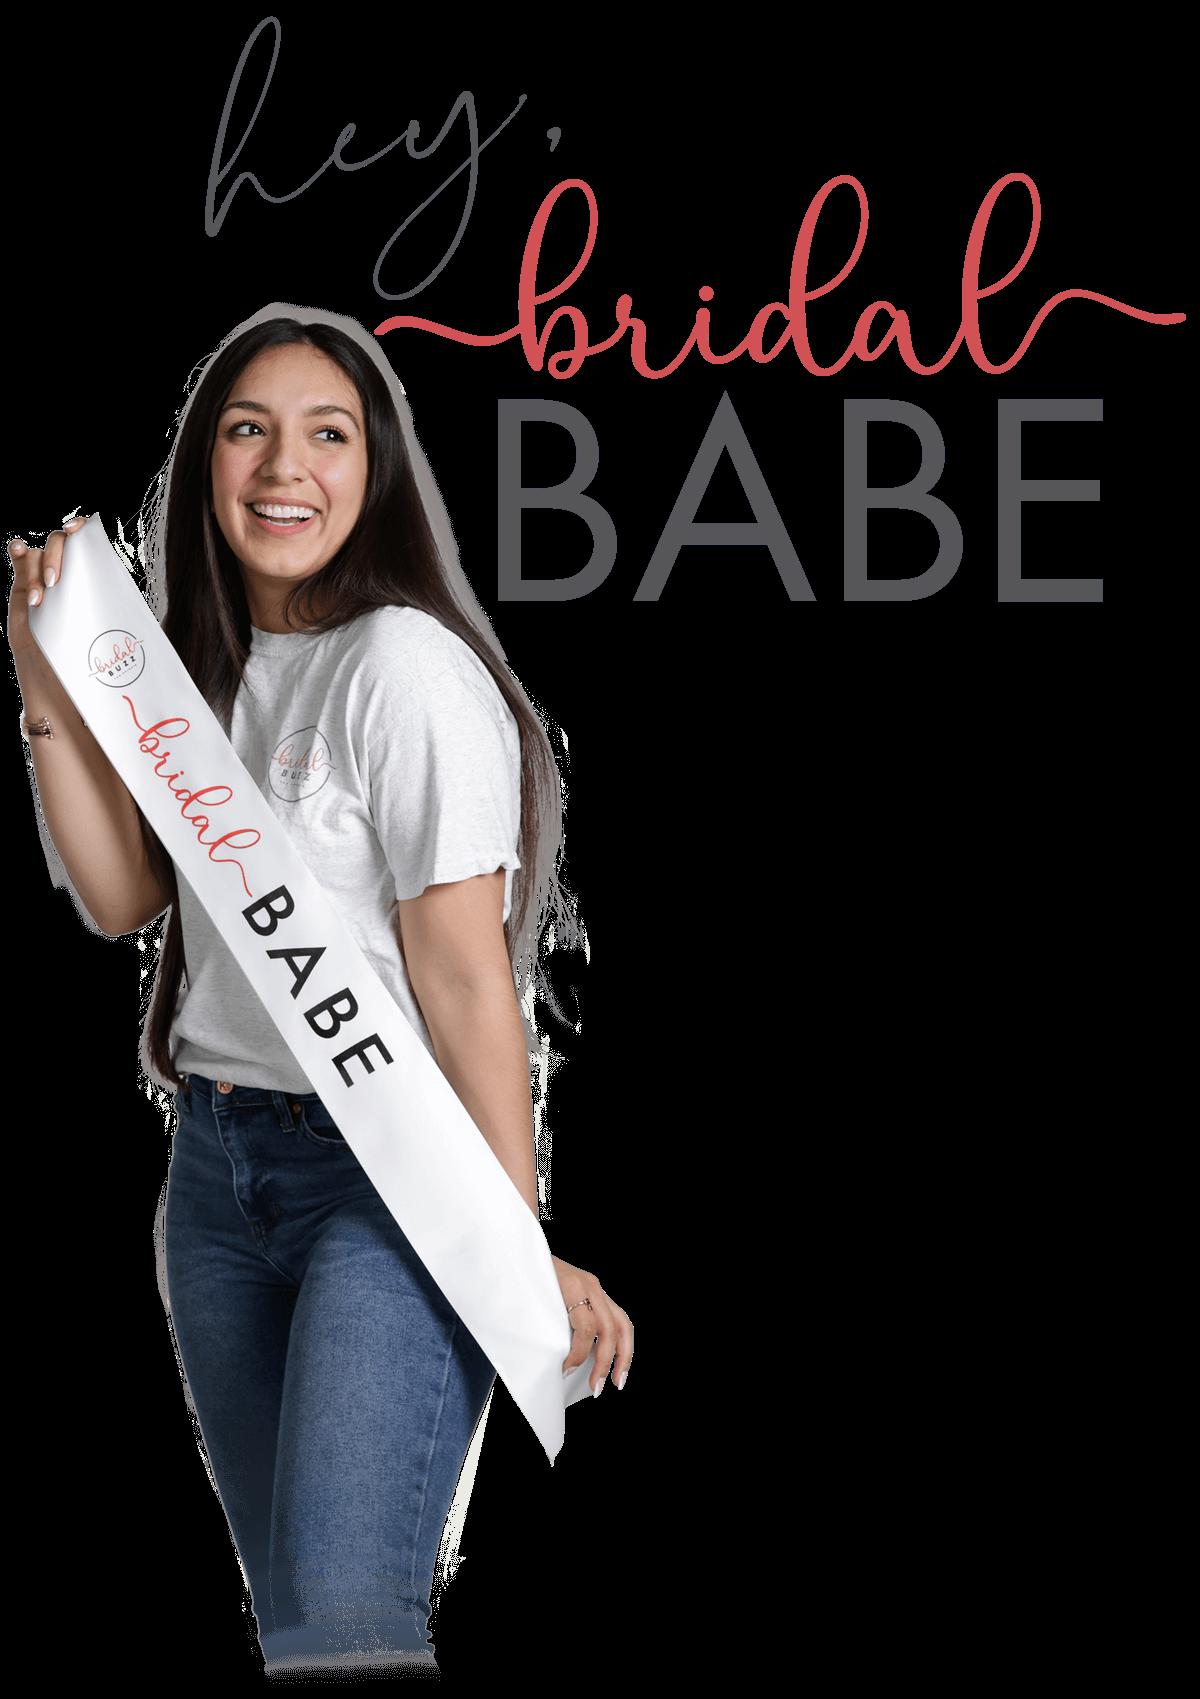 Hey Bridal Babe - Be part of the Bridal Buzz - San Antonio Weddings